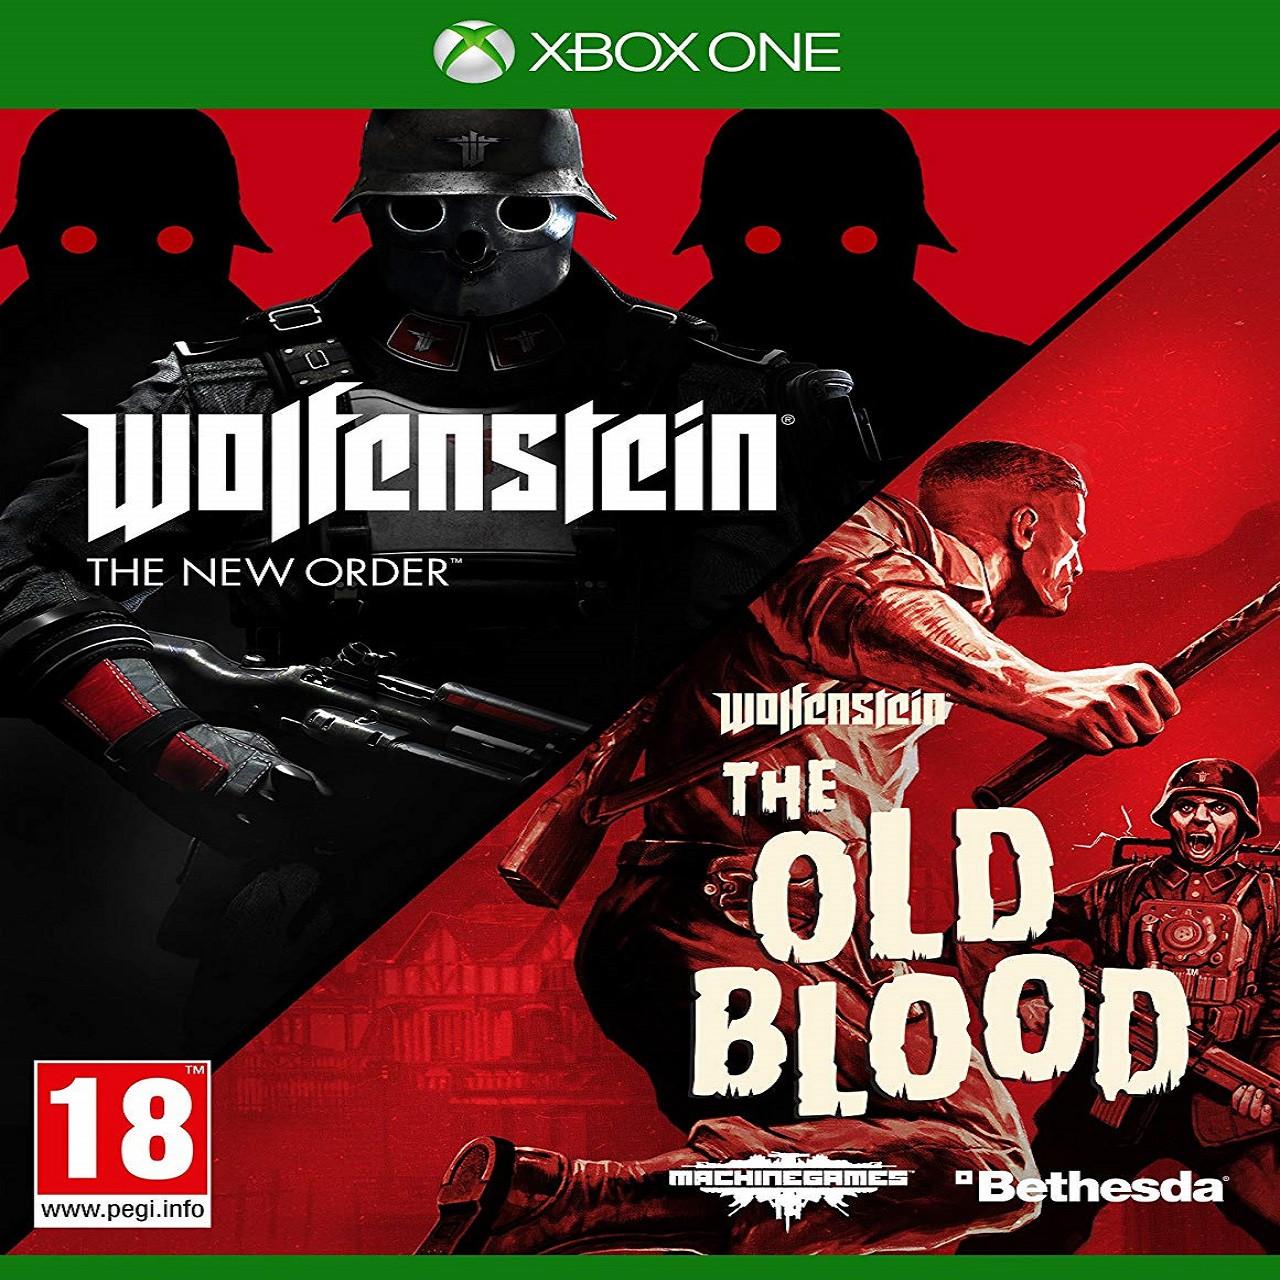 Wolfenstein The New Order/The Old Blood (російська версія) XBOX ONE (Б/В)